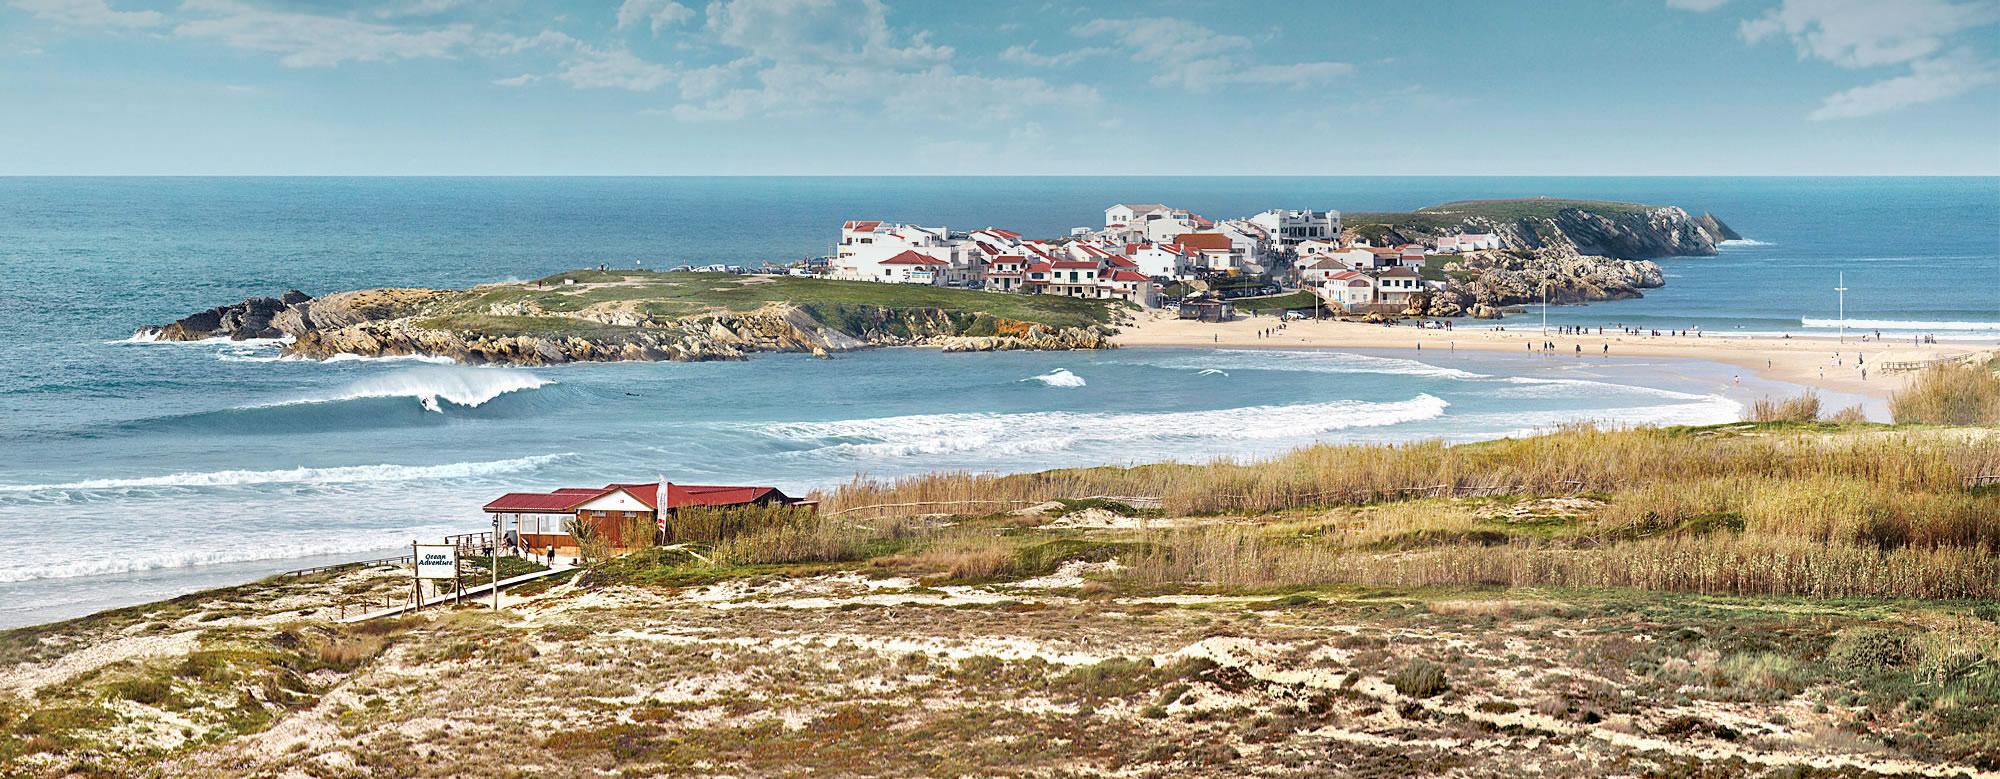 peniche portugal baleal island Ocean adventure surfcamp